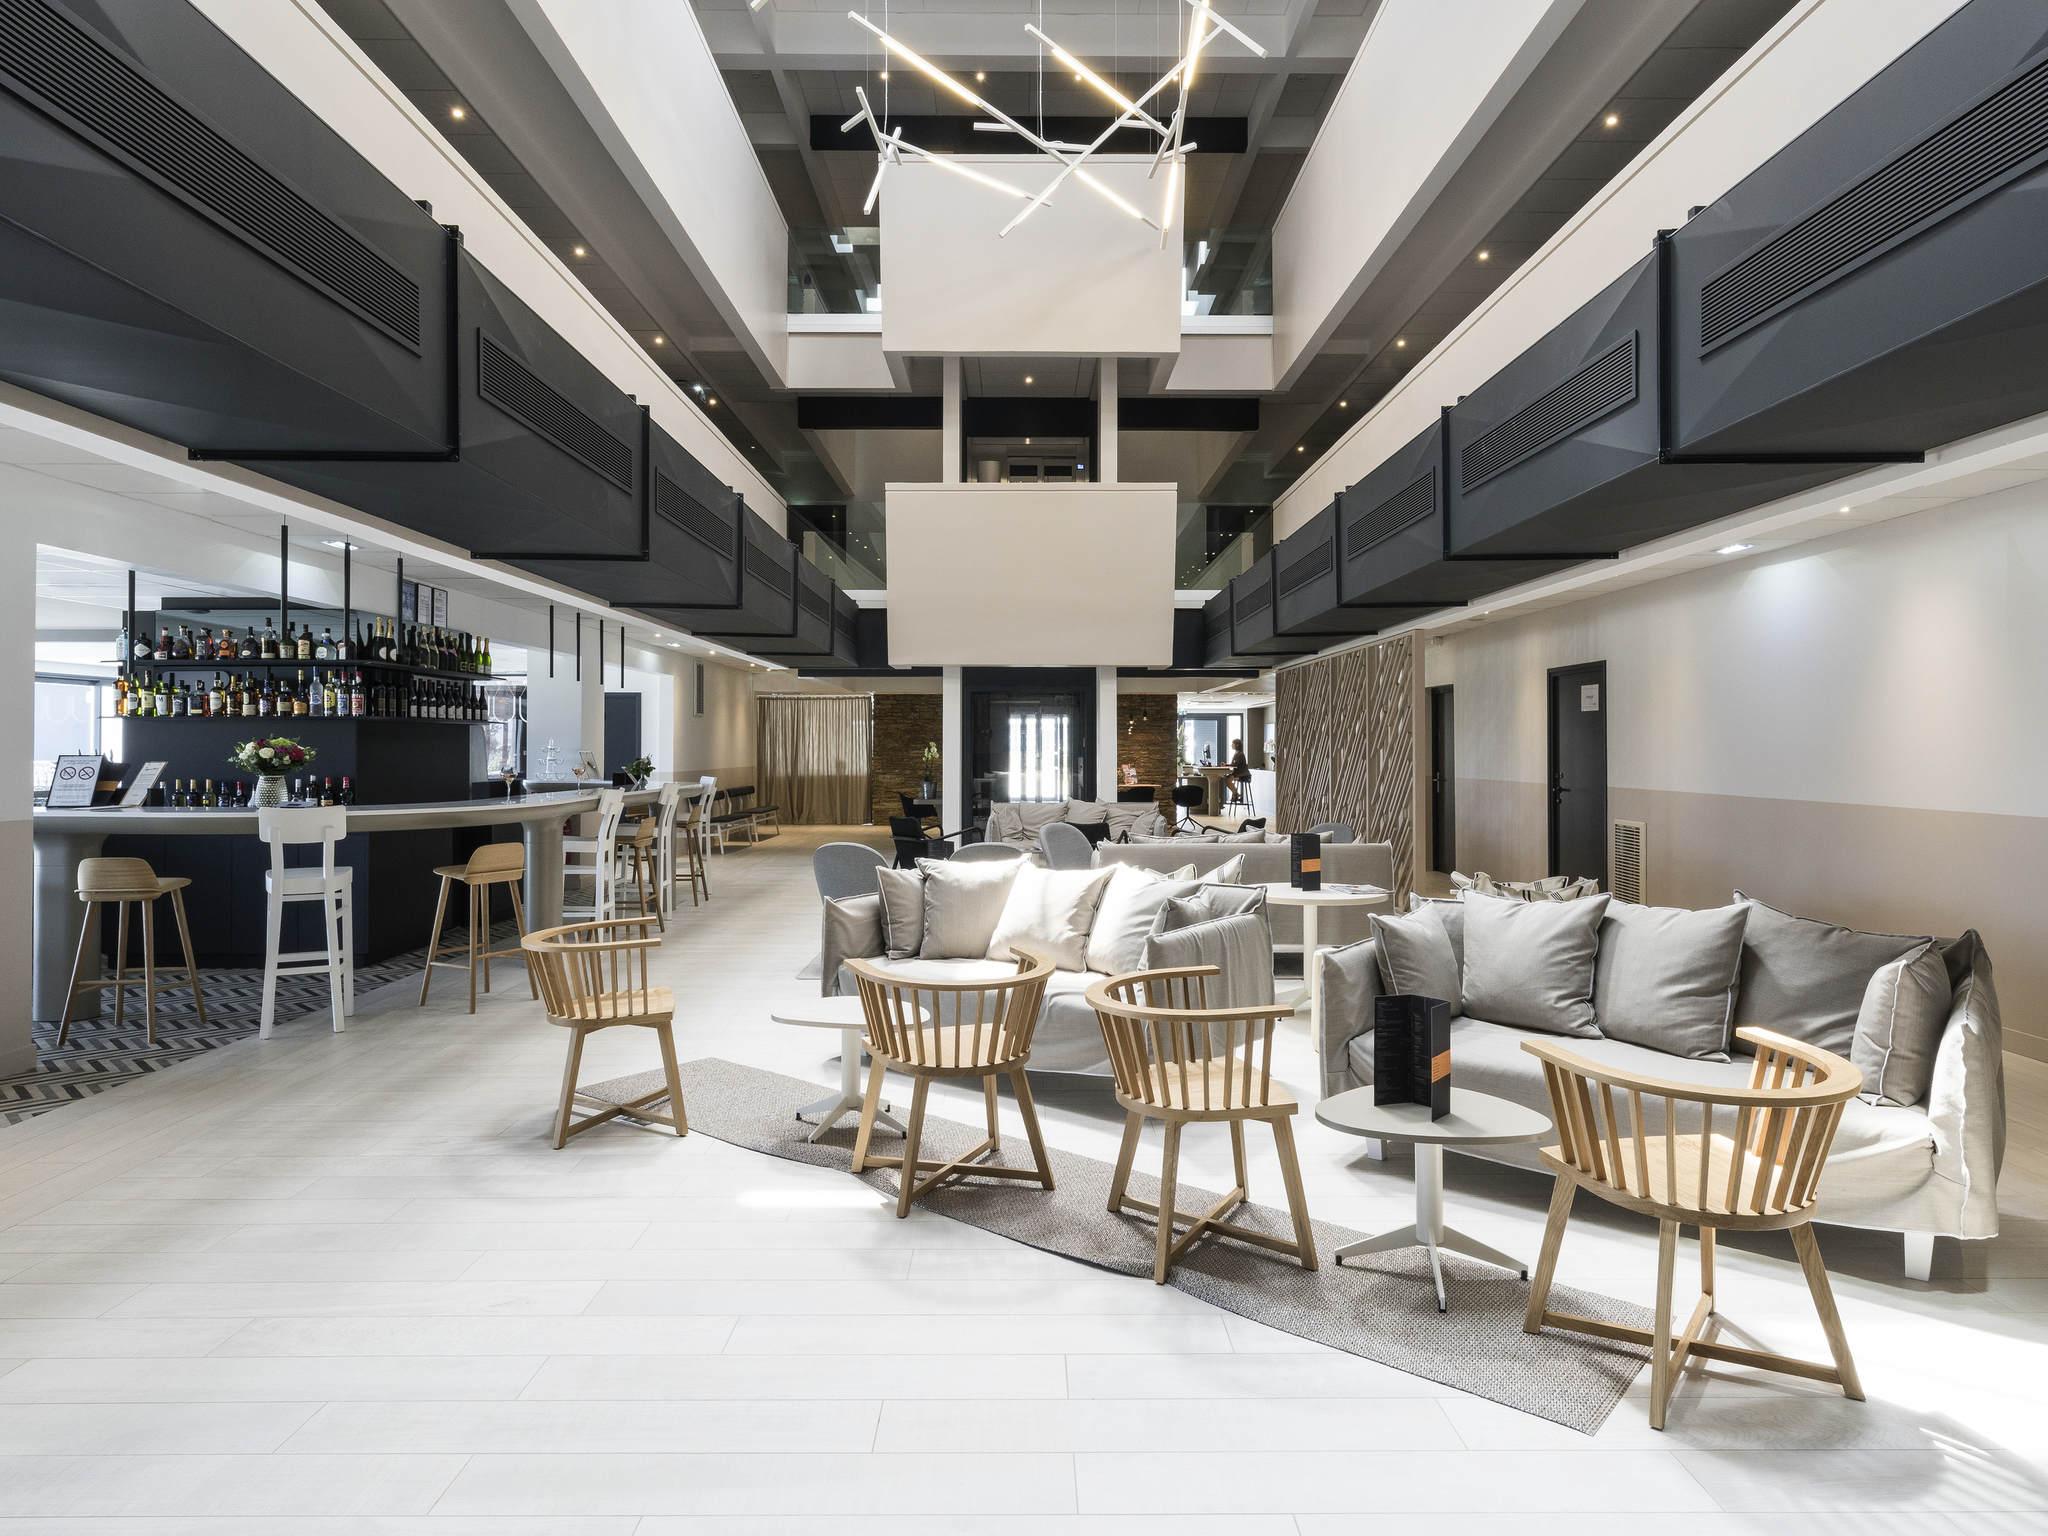 Hôtel - Hôtel Mercure Bastia Biguglia